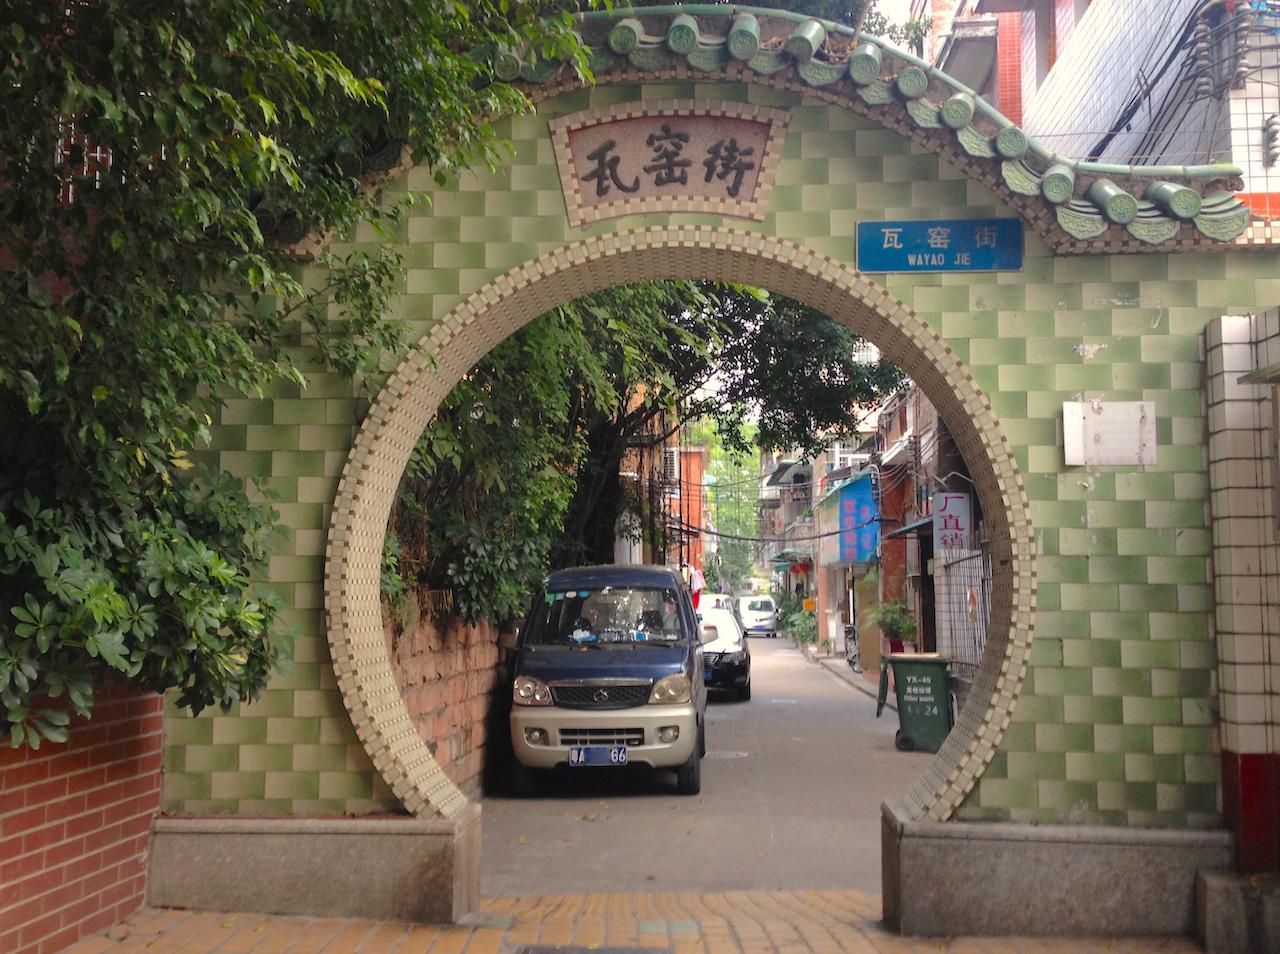 Guangzhou Street Scene 1